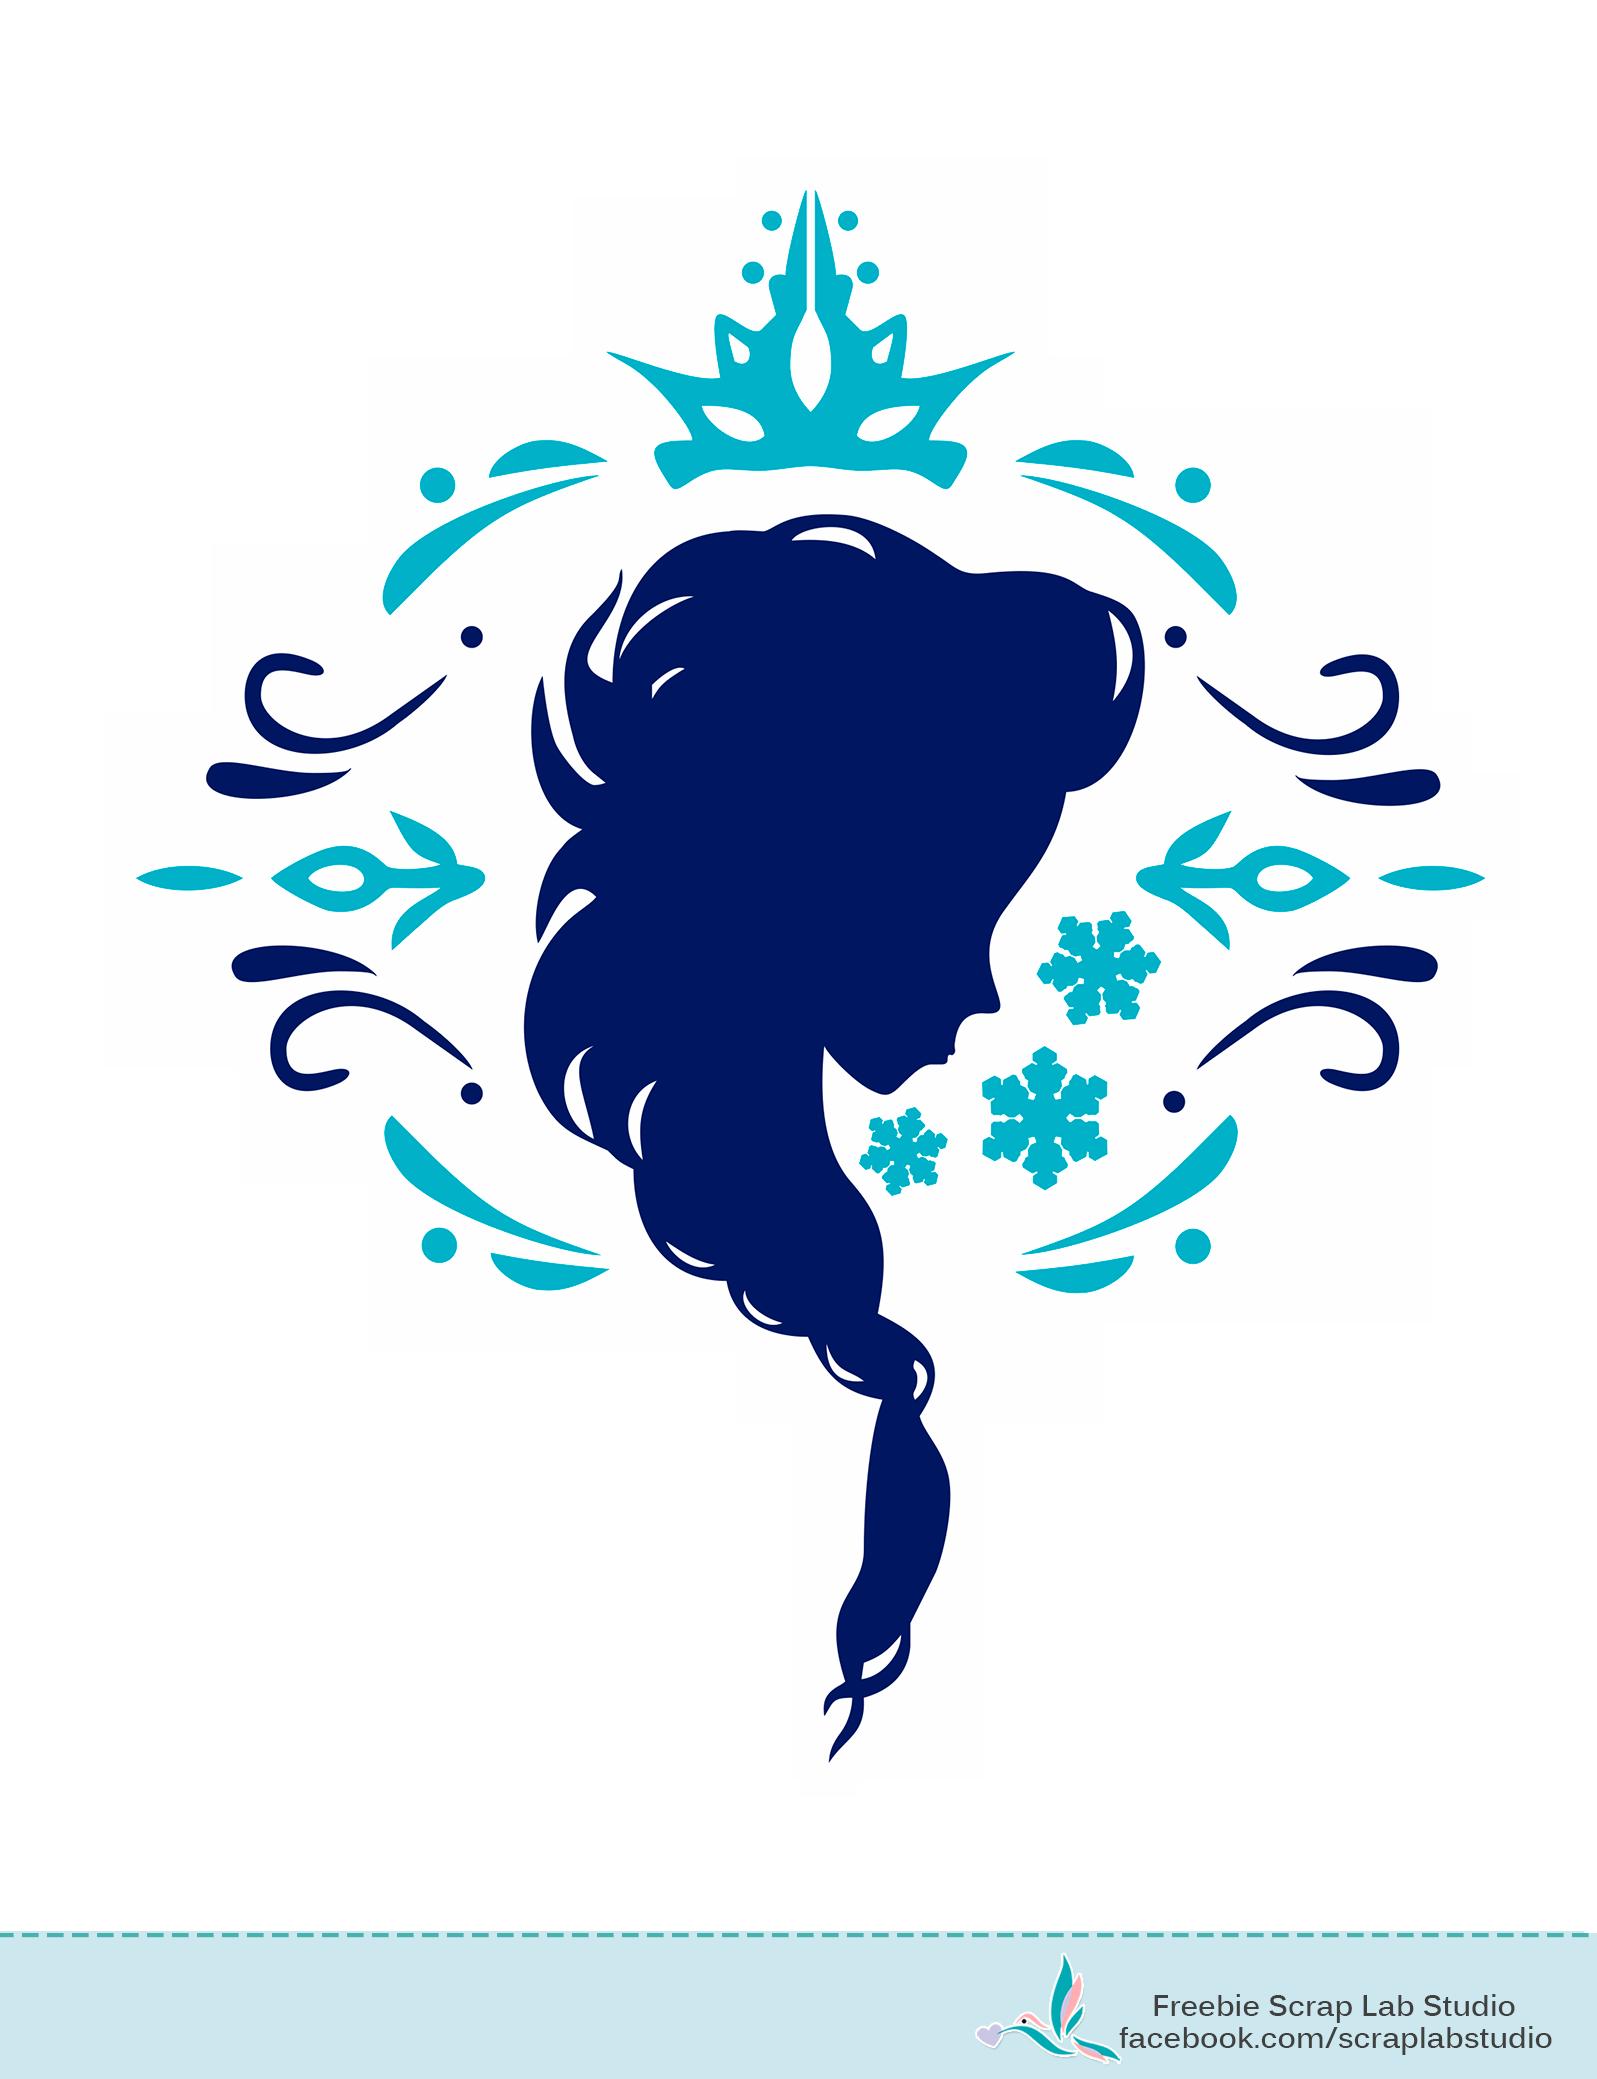 Cinderella pumpkin silhouette clipart png freeuse download Ideias | Frozen | Pinterest | Cricut, Stenciling and Silhouettes png freeuse download